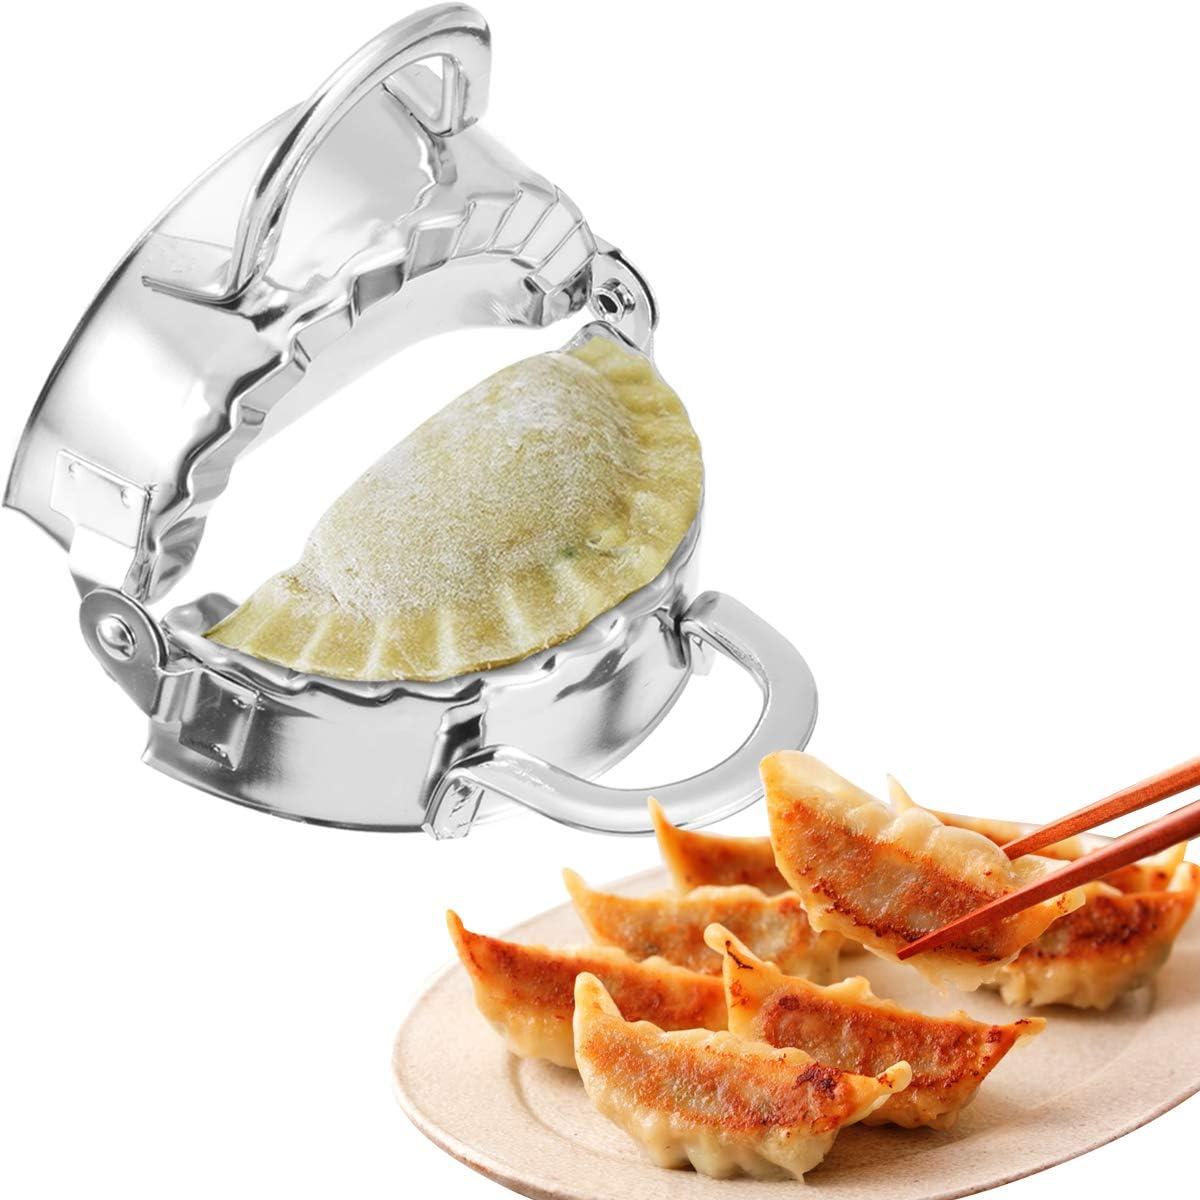 Handmake Stainless Steel Dumpling Maker DIY Dumplings Dumpling Tool Dumpling Maker Press Dumpling Molds Stainless Steel Ravioli Stainless Dumpling Tool for Home Dumplings Kitchenware 2 Piece